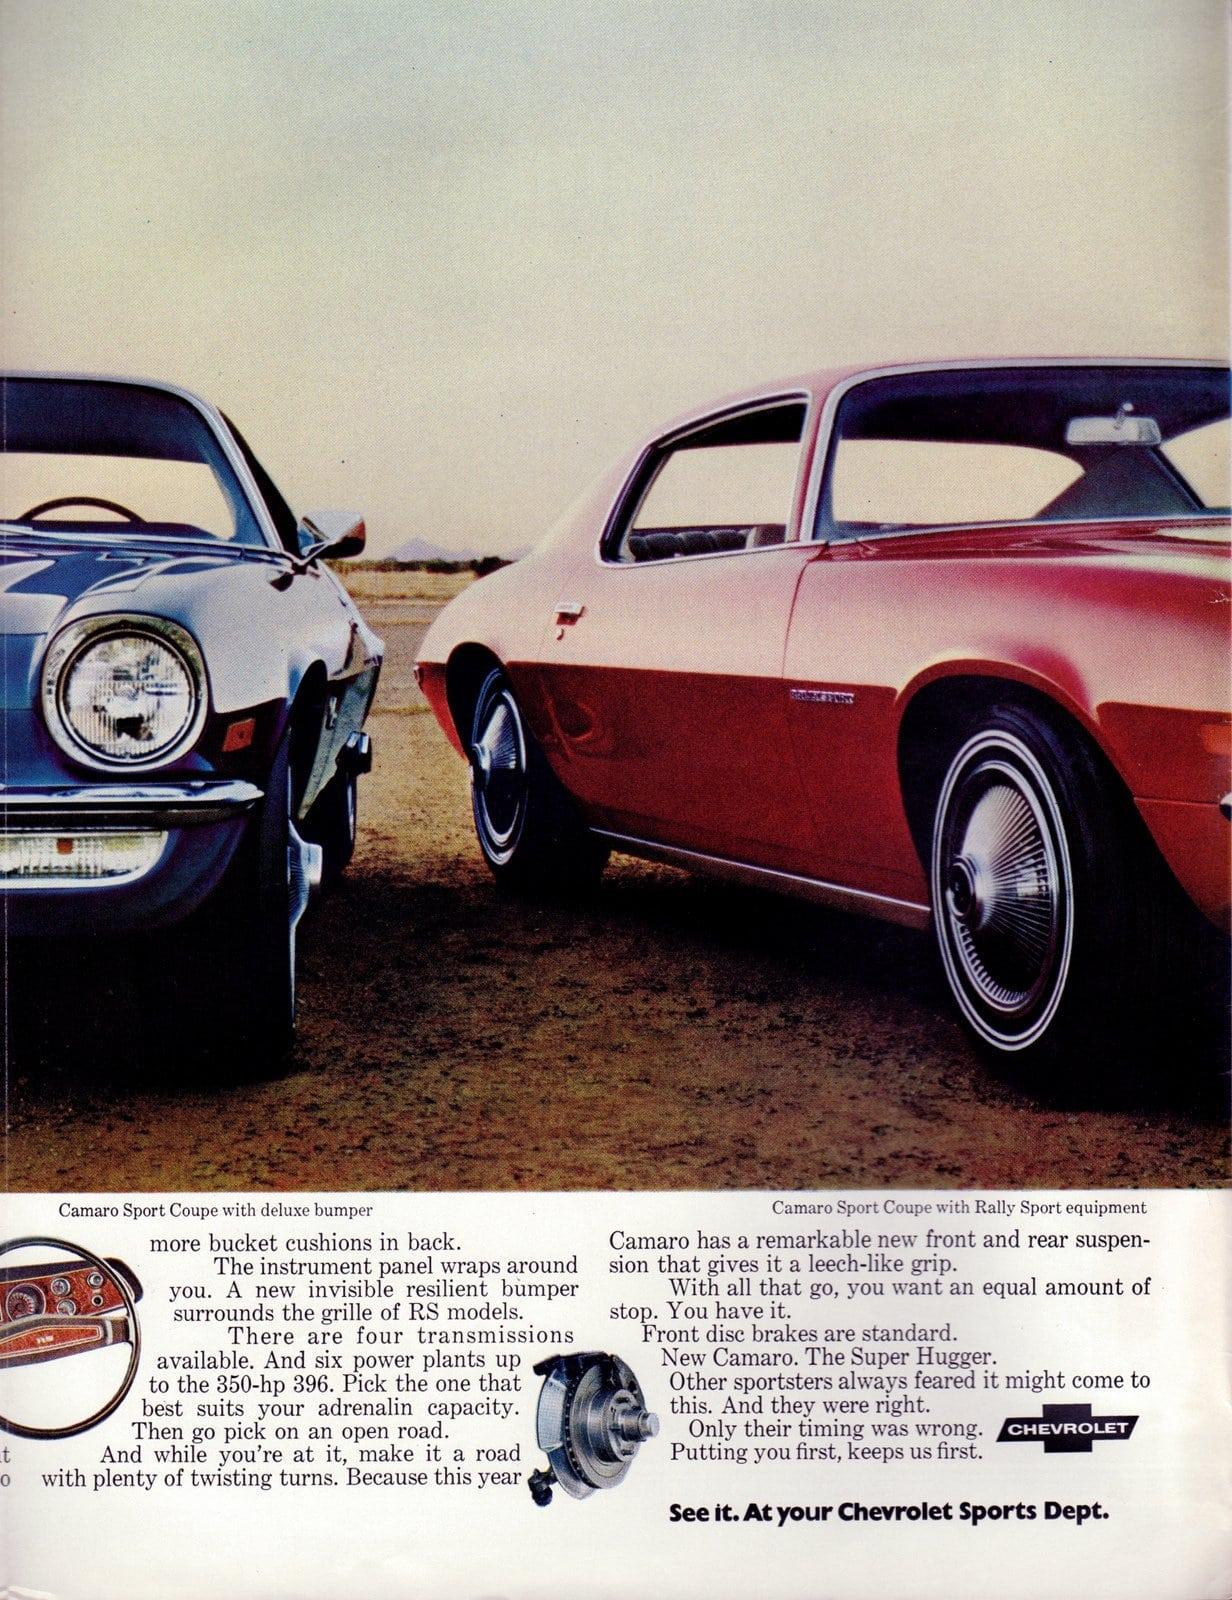 1970 Camaro Super Hugger - Classic Chevy cars (3)